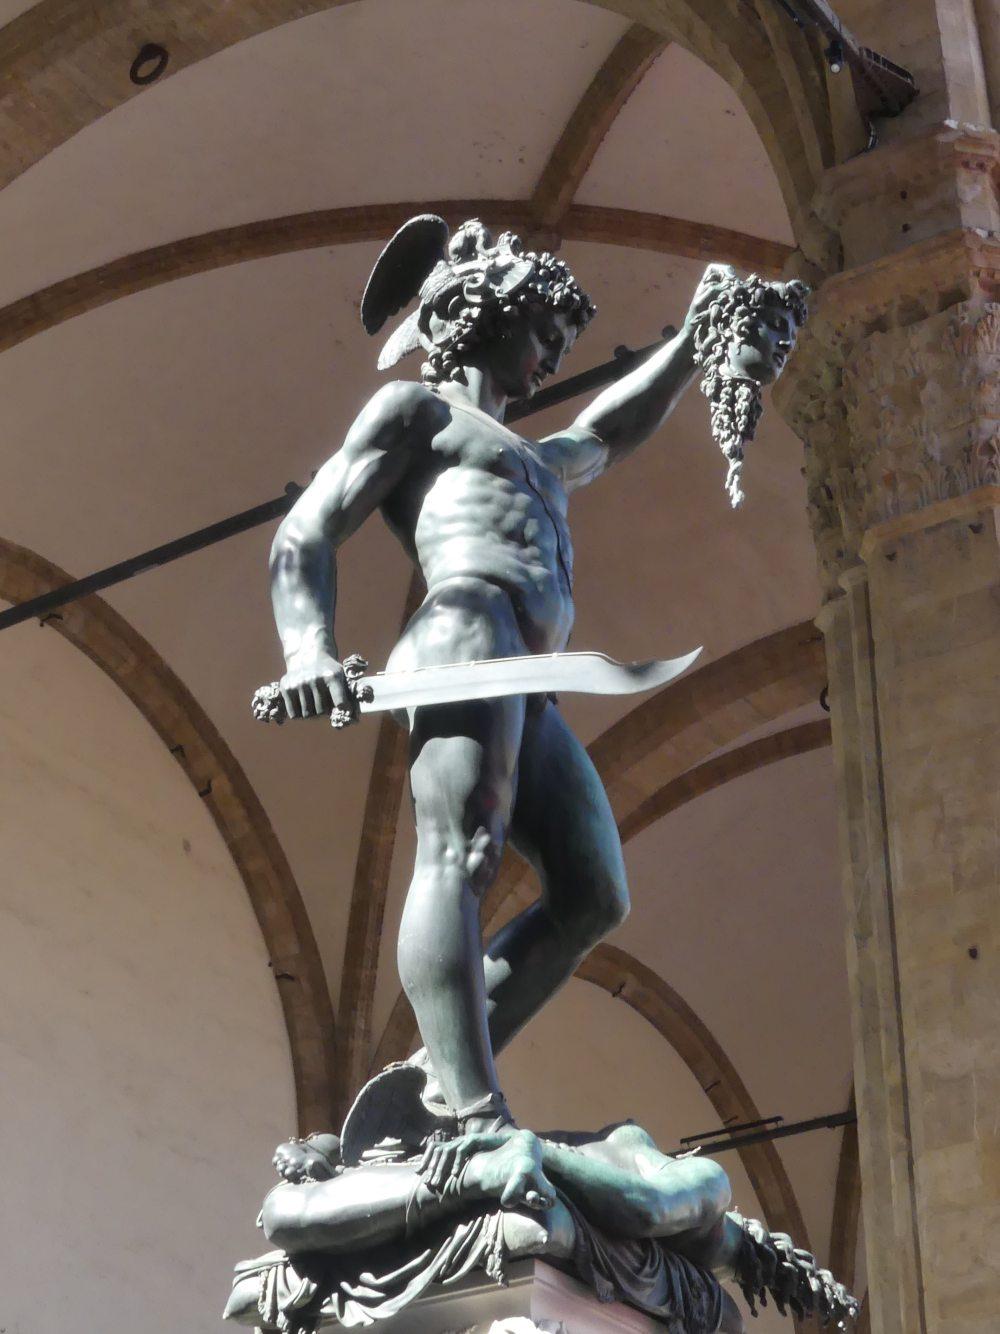 Bronzestatue hält abgeschlagenen Kopf hoch.